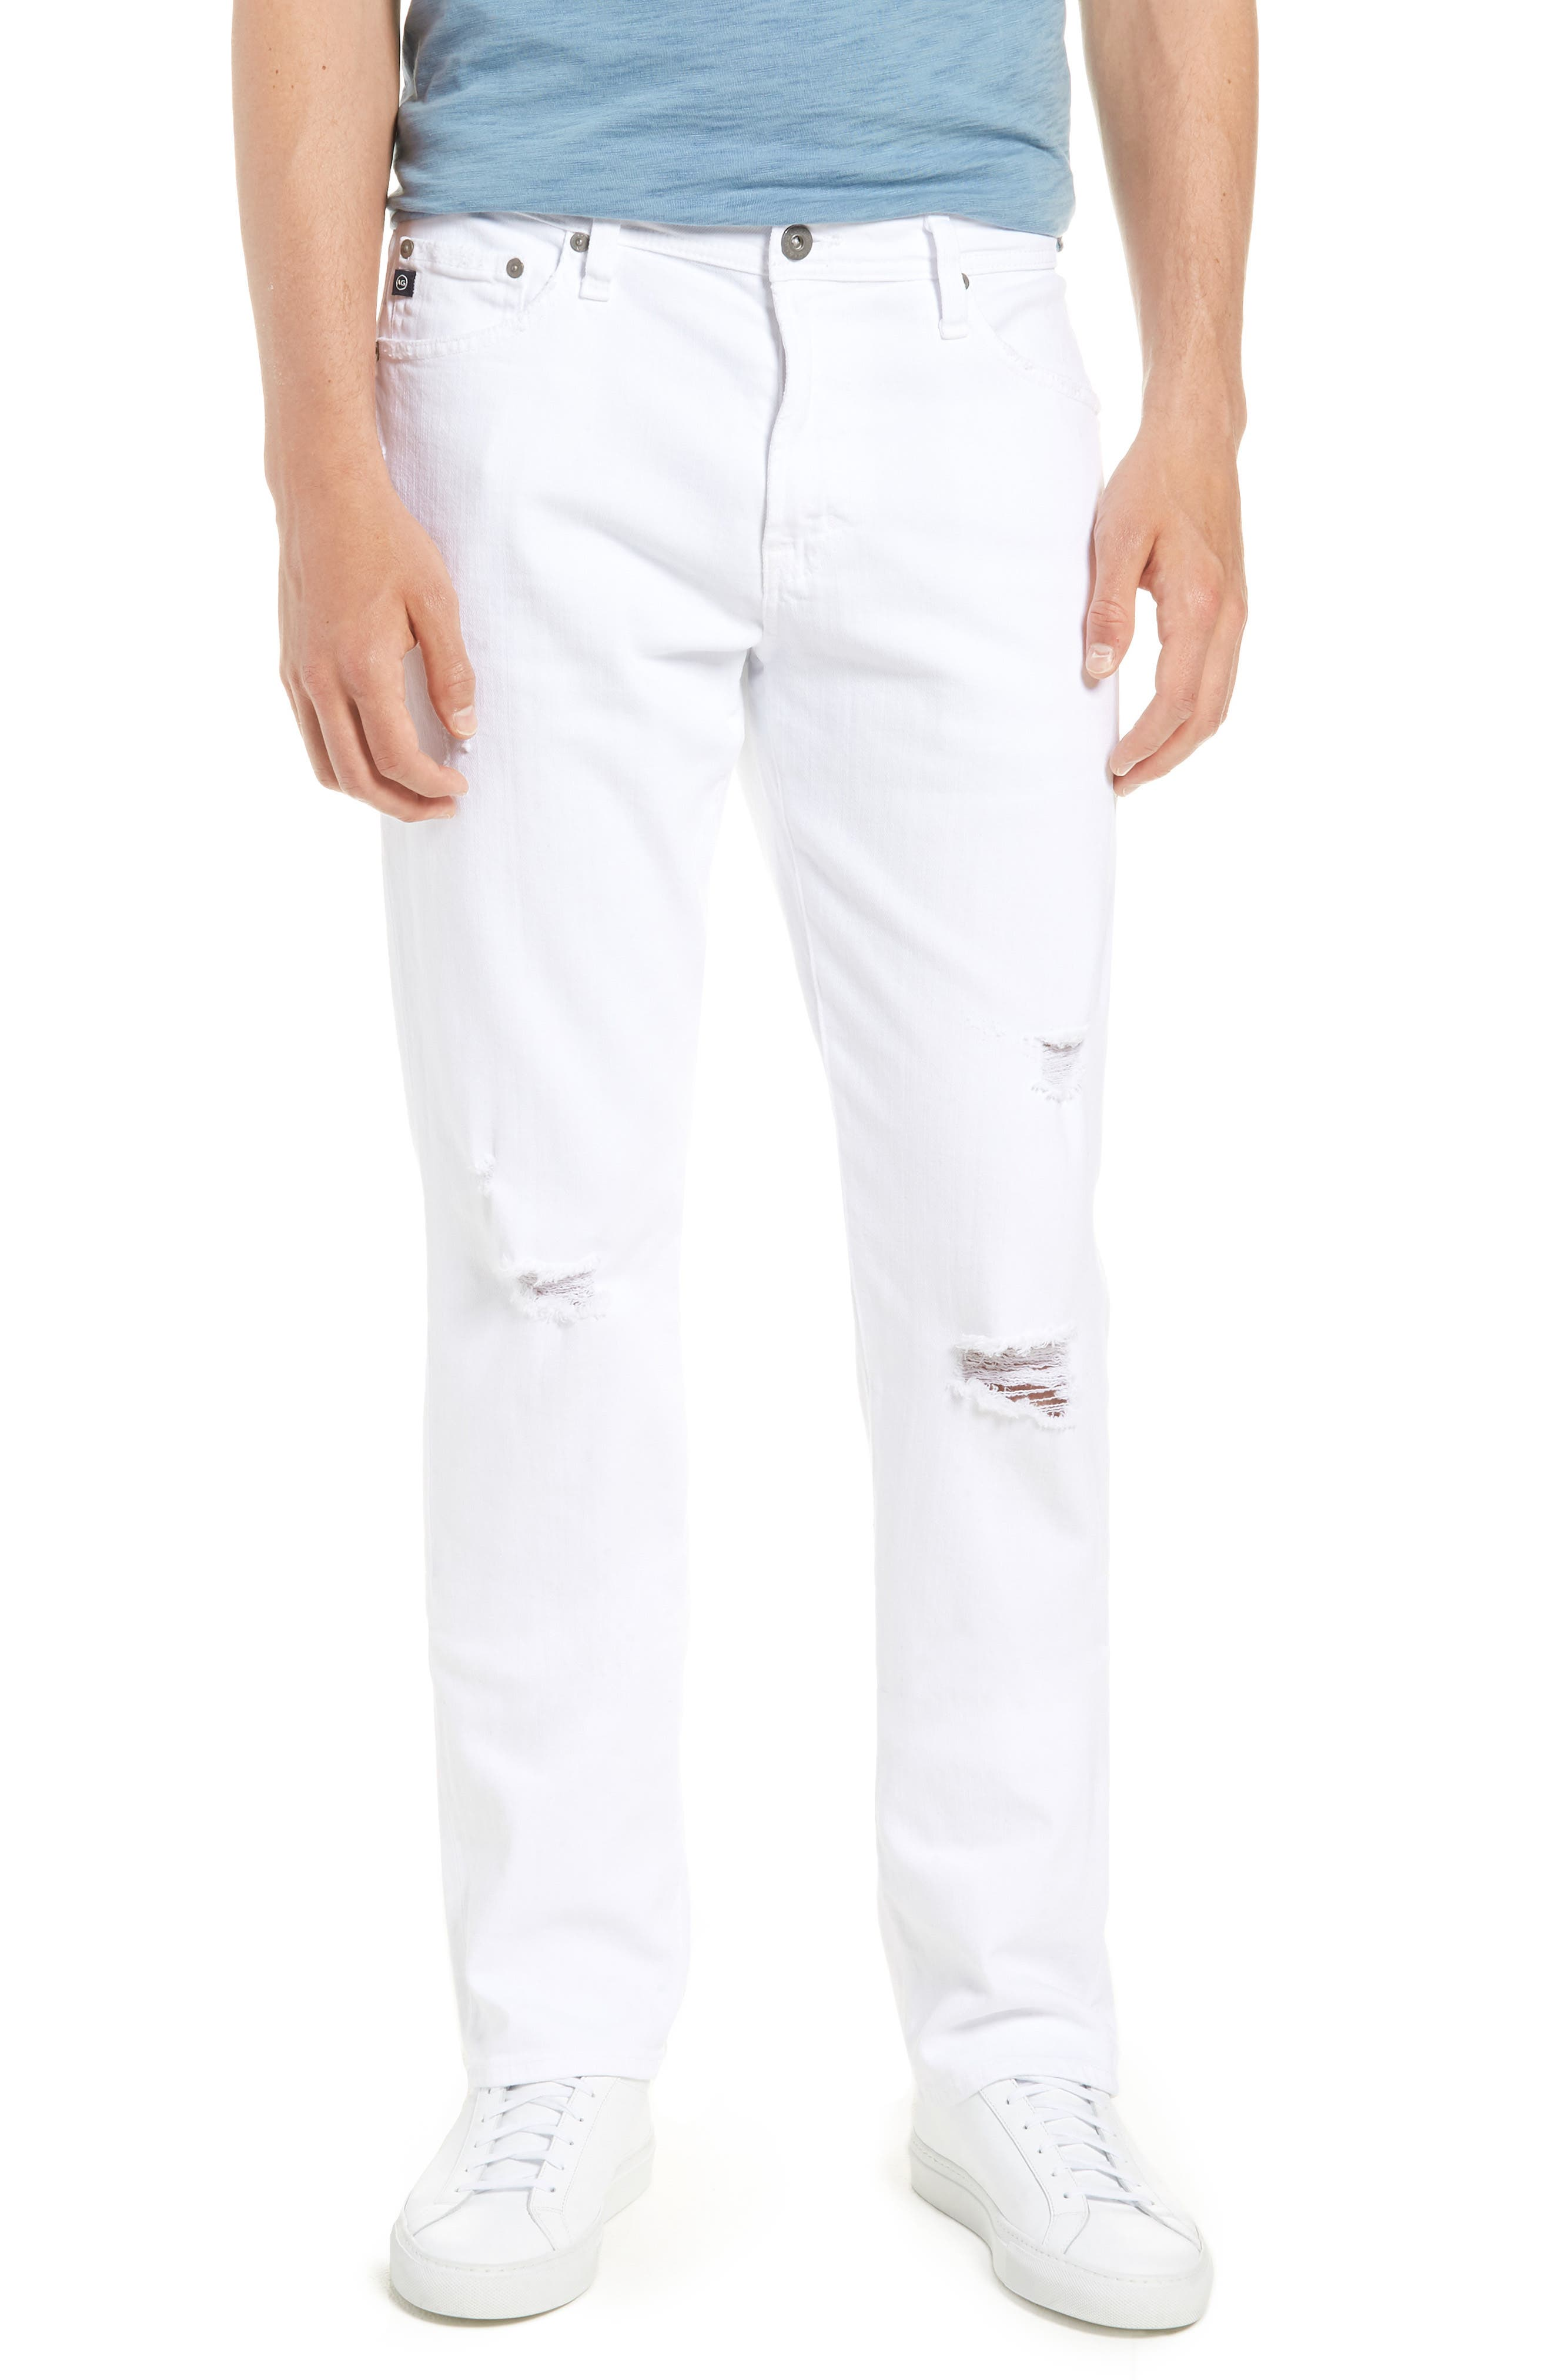 Everett Slim Straight Leg Jeans,                         Main,                         color, 129